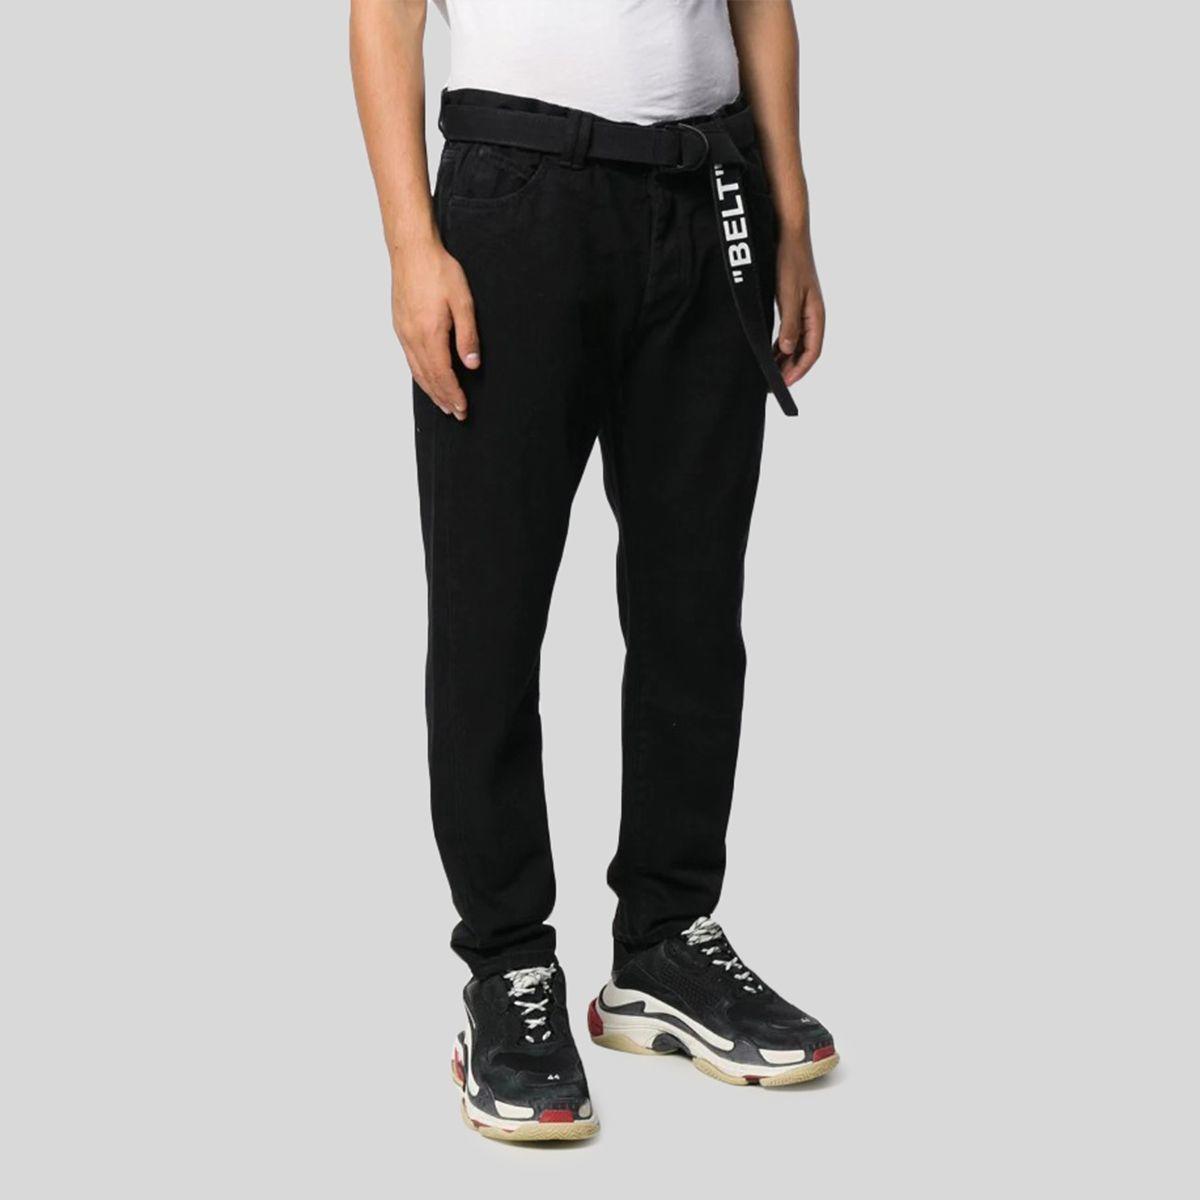 offwhite オフホワイト ドロップ クロッチ ブラック デニムジーンズ Dropped Crotch Black Denim Jeans